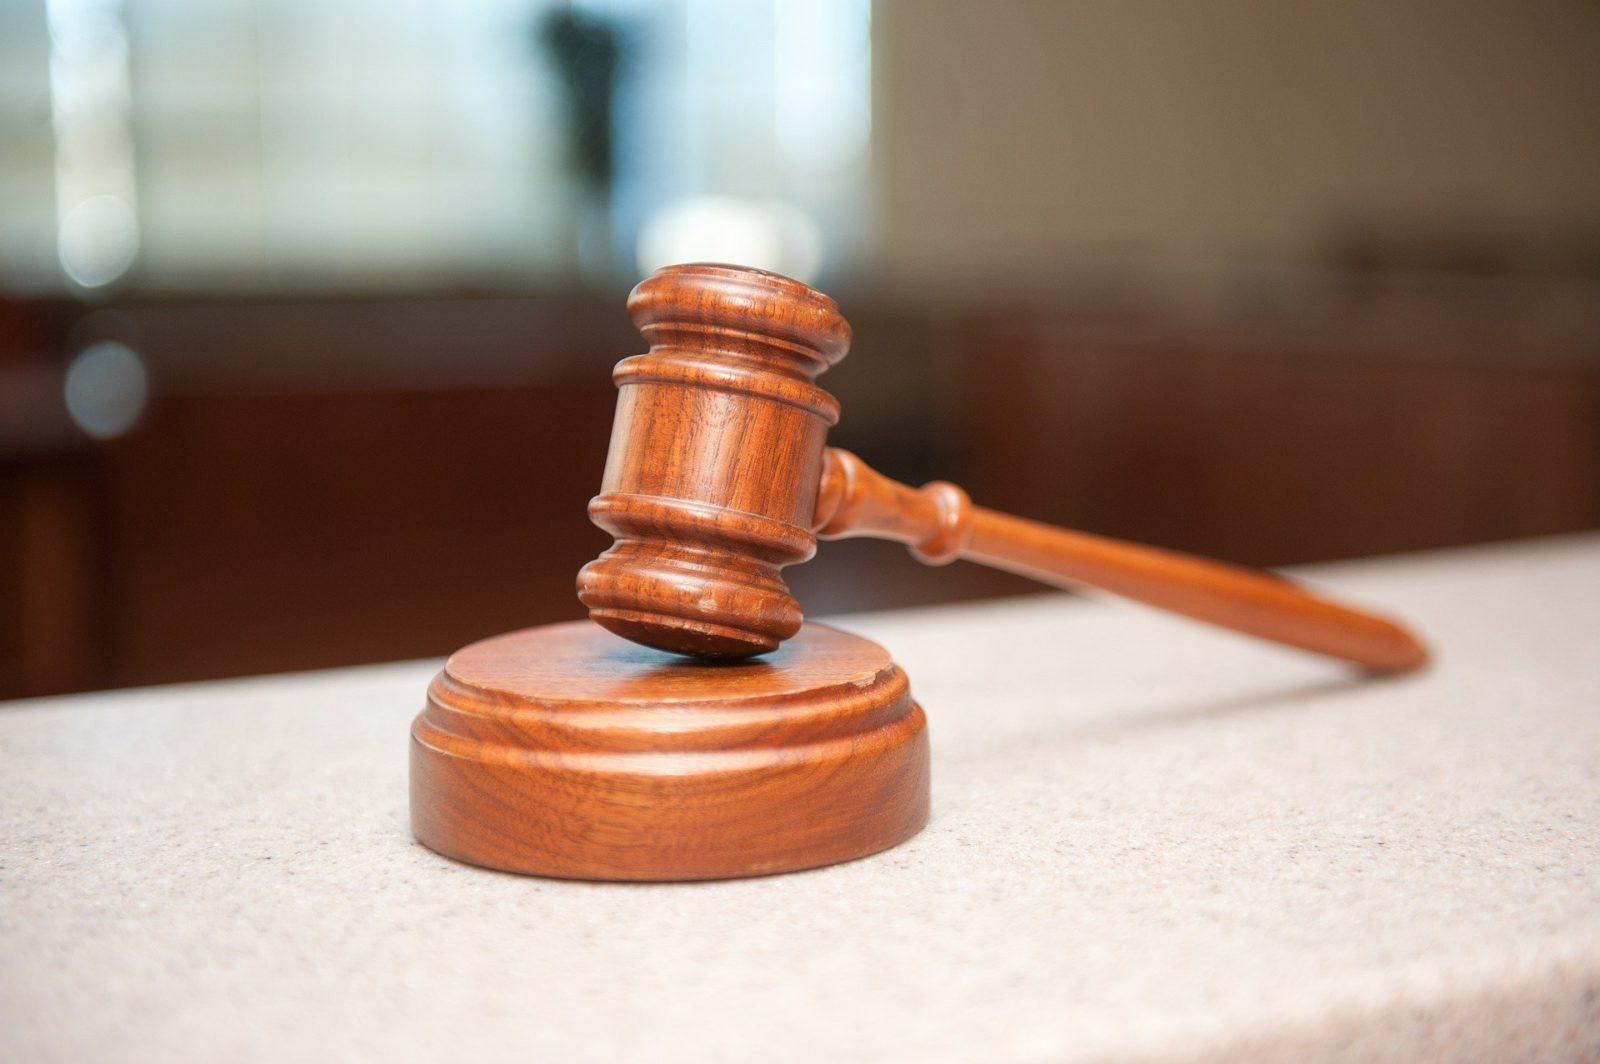 judge_amlcft_eu-uae